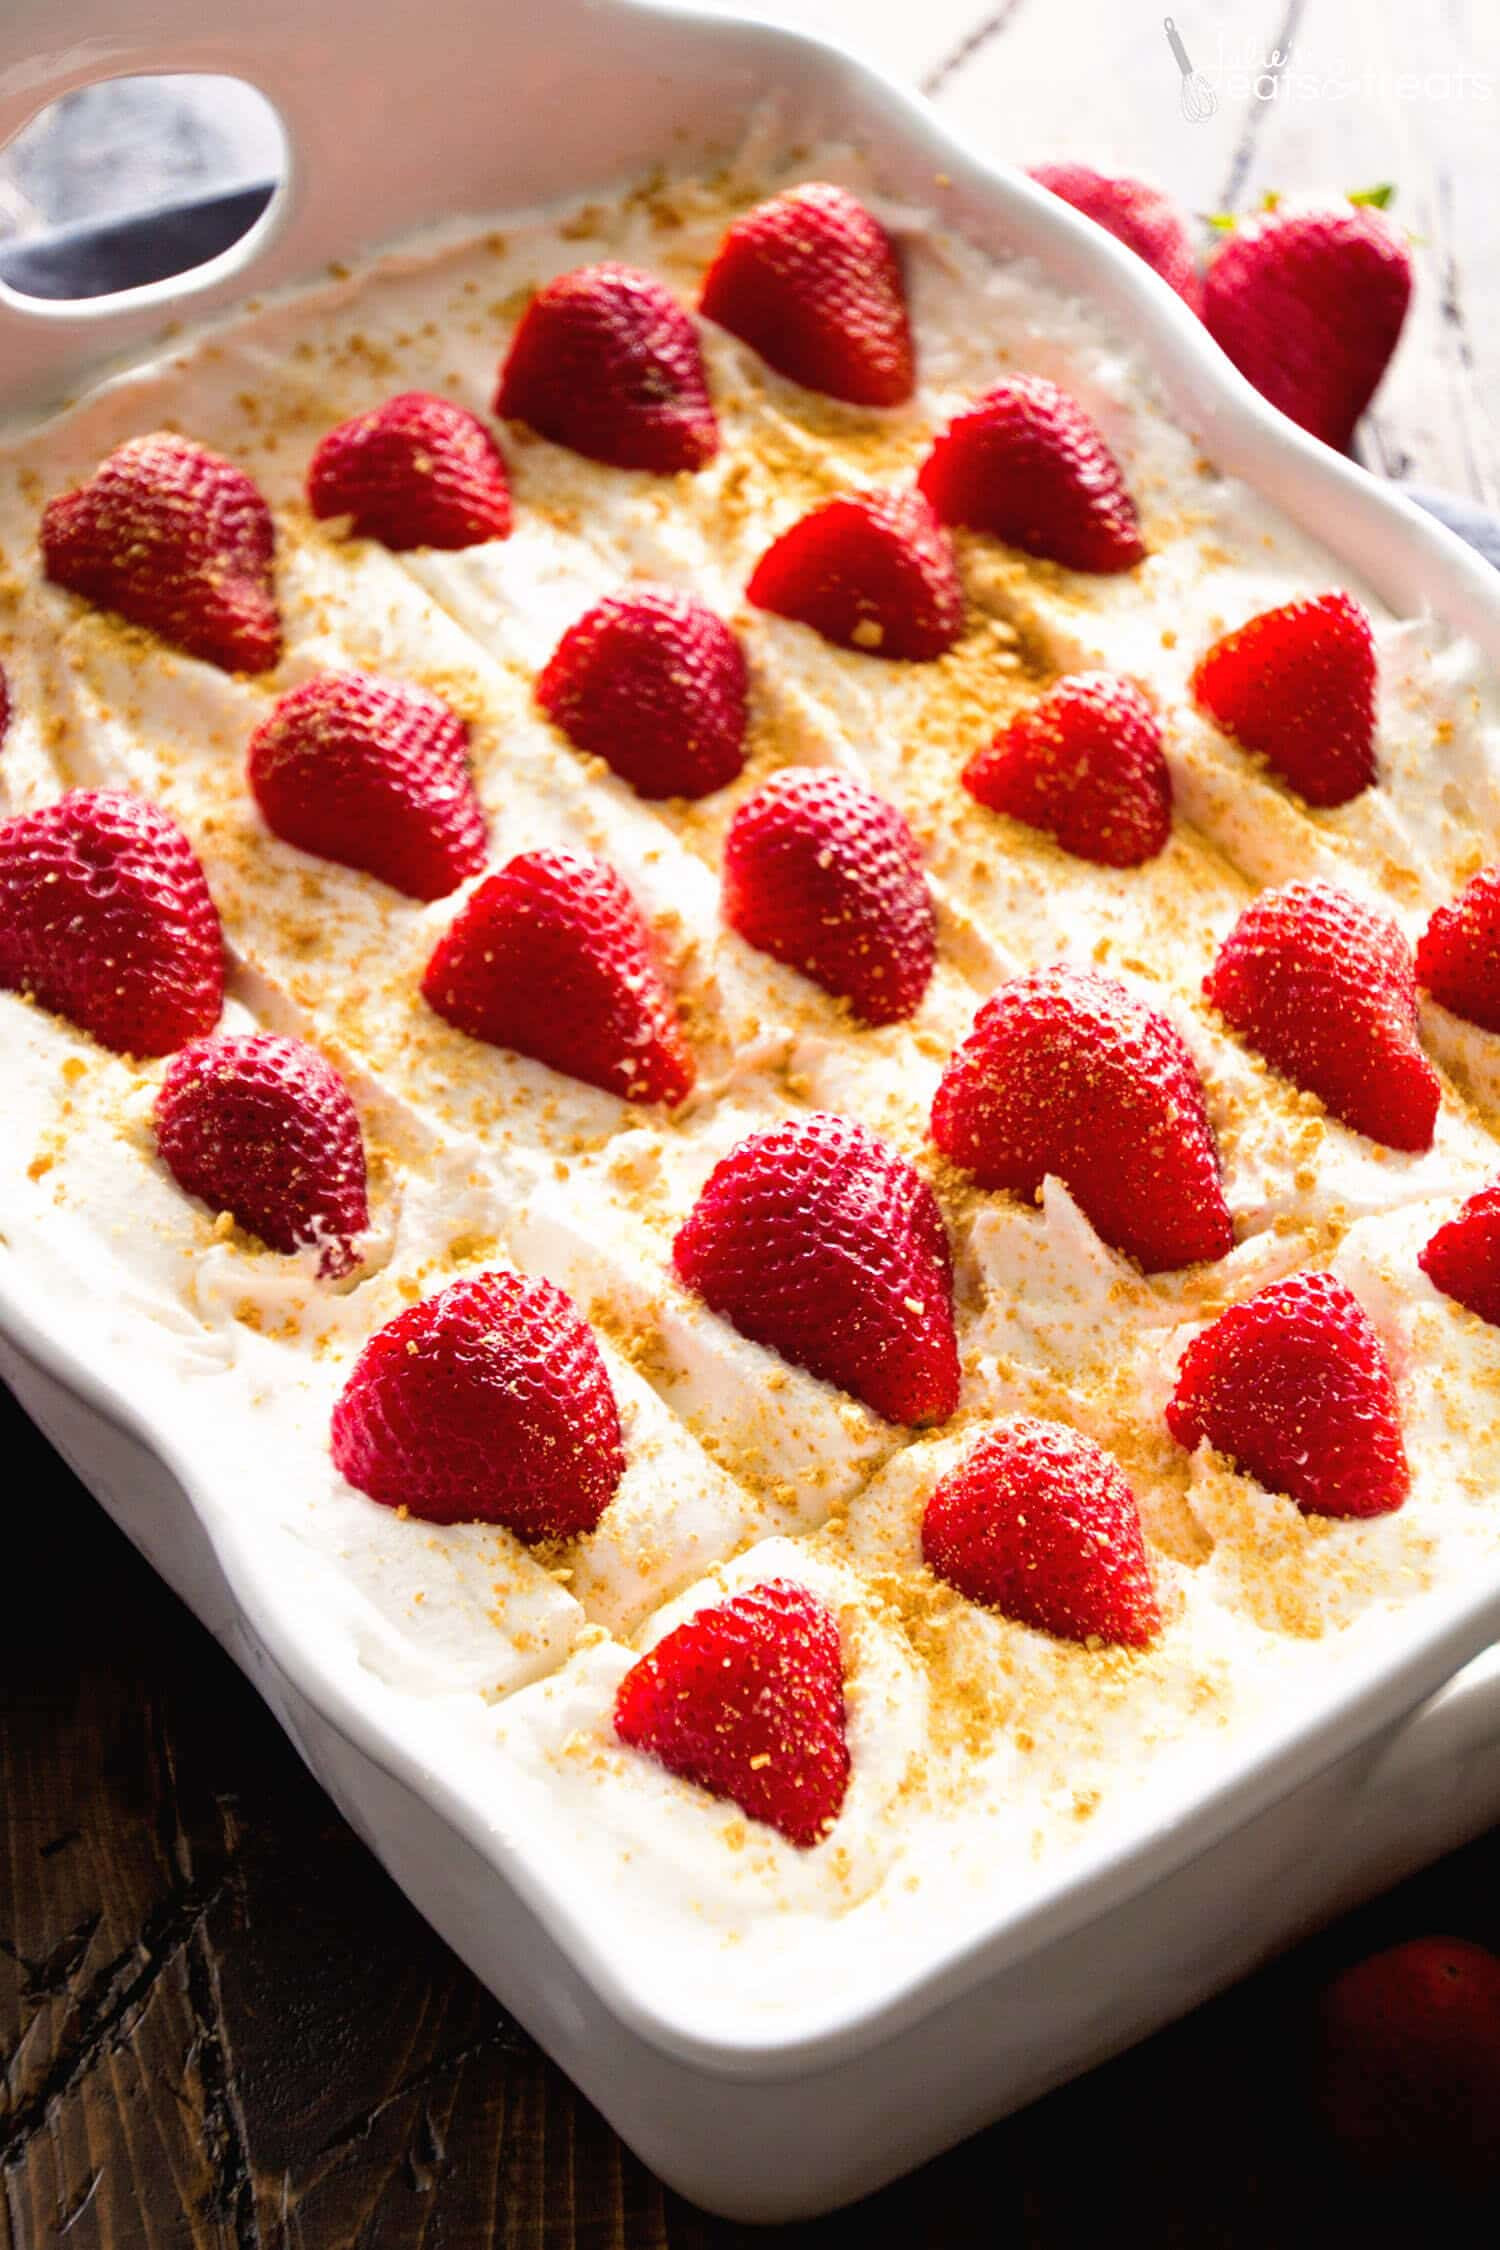 No Bake Strawberry Dessert  No Bake Strawberry Cheesecake Icebox Cake Recipe Julie s